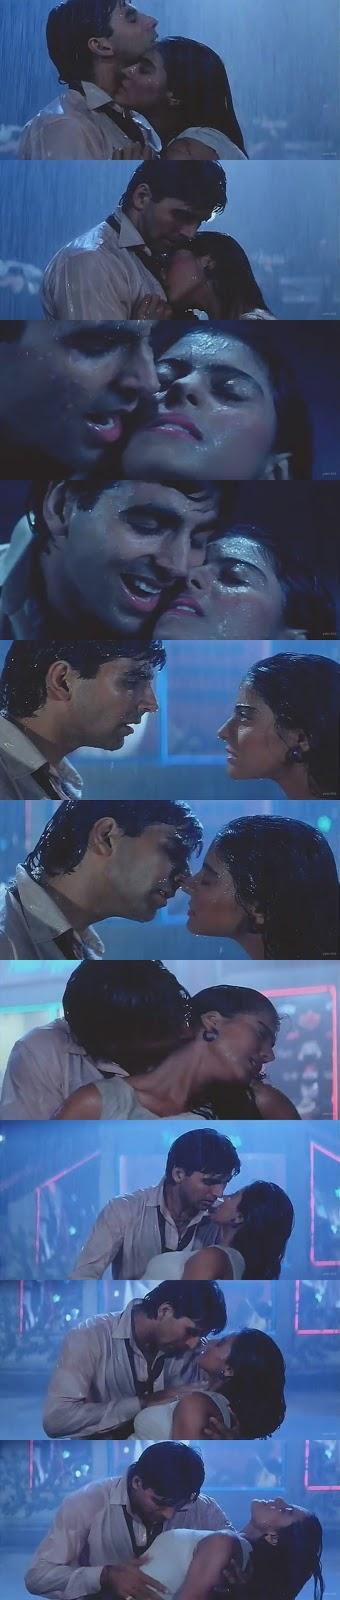 Shringaar 4 Full Movie In Hindi 720p Download - bitbucket.org